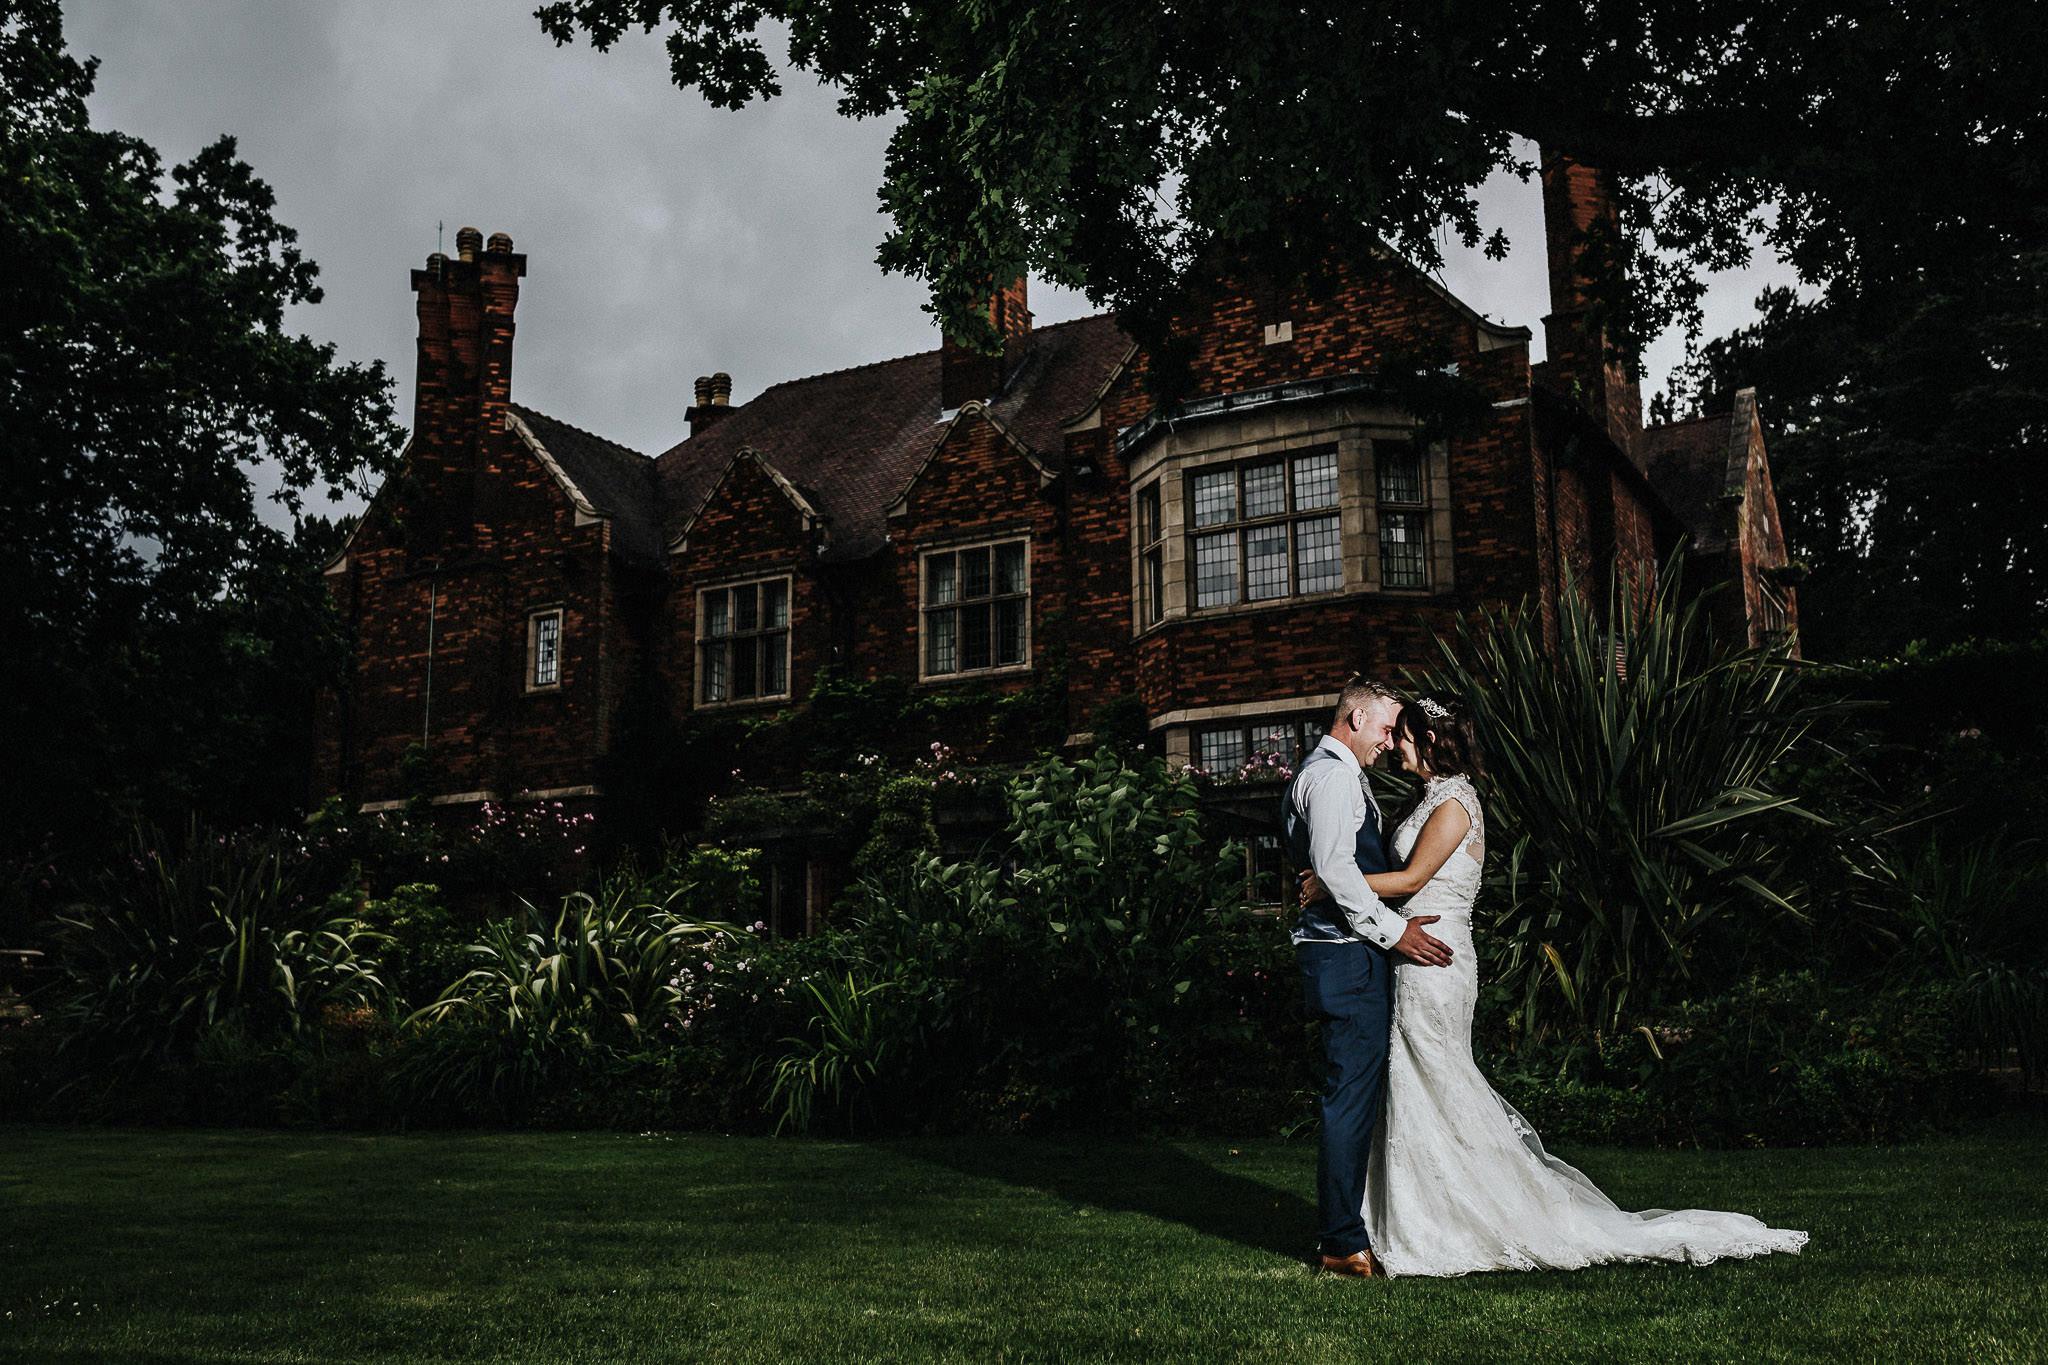 Staffordshire-Wedding-Photographer-226.jpg